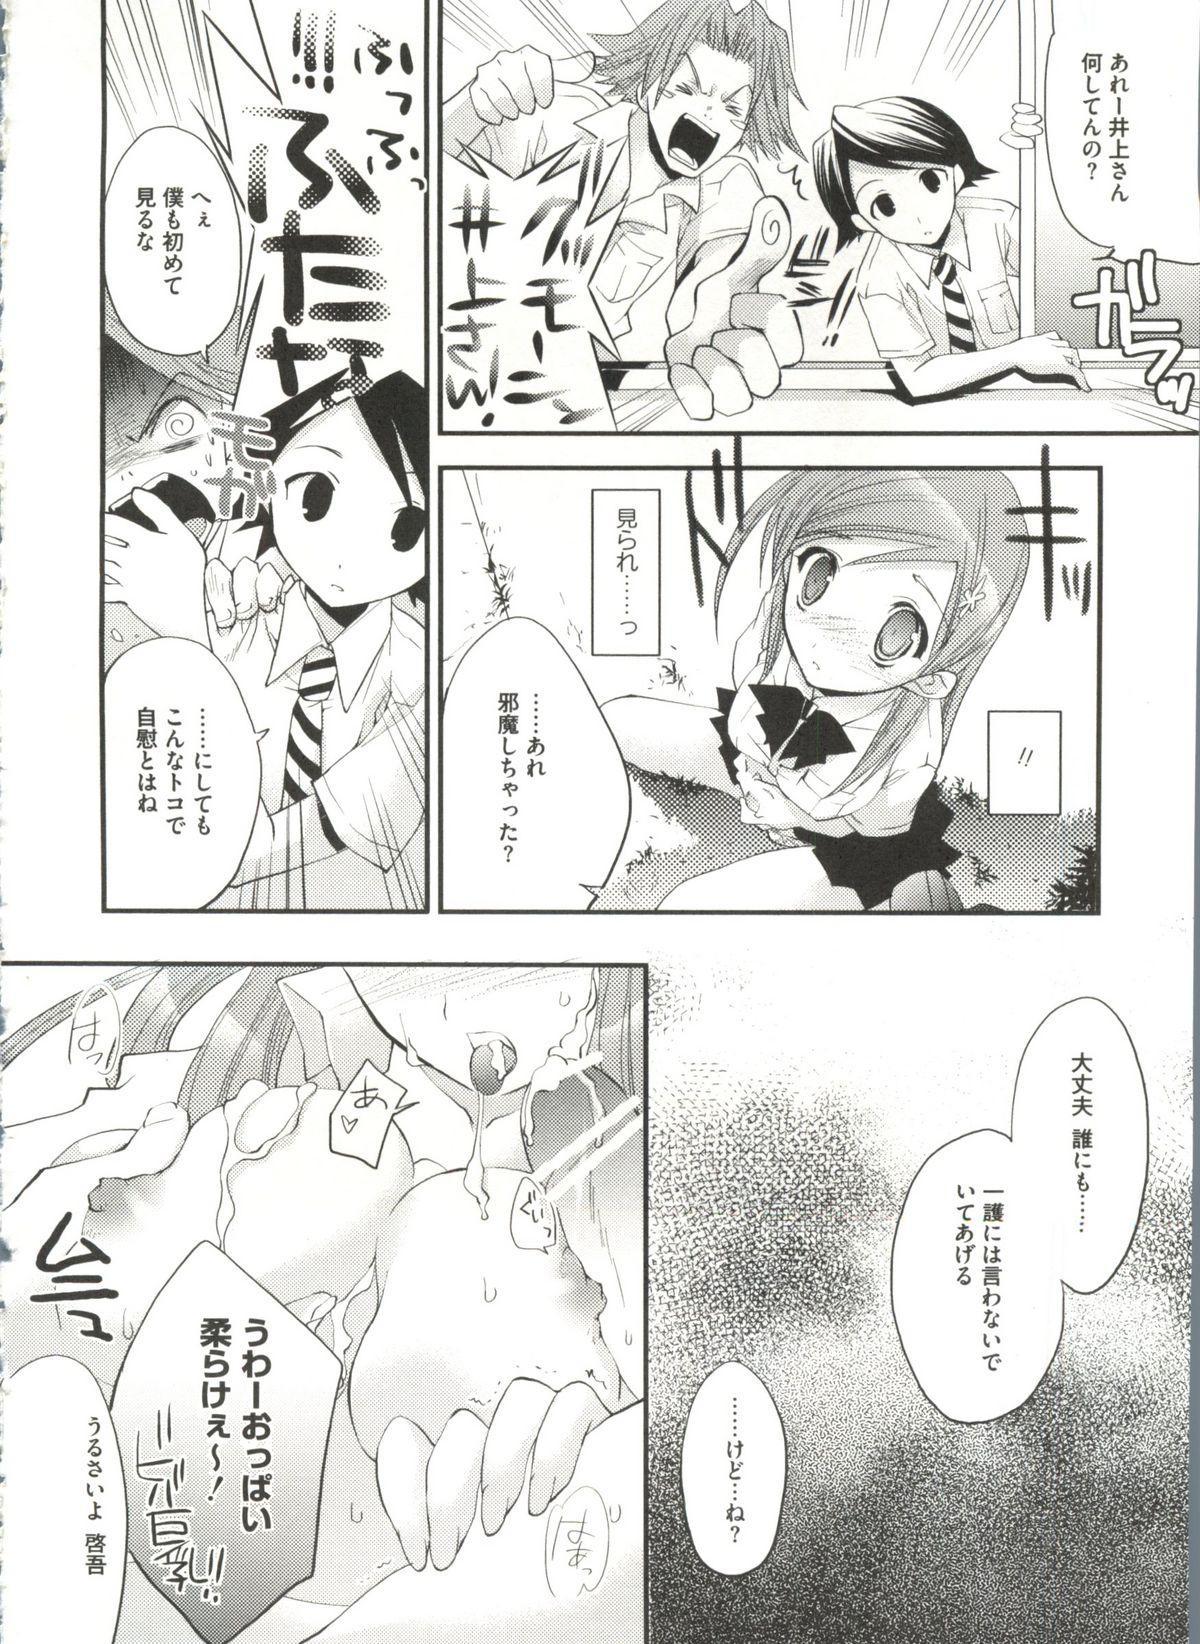 Geki Jump Super 53